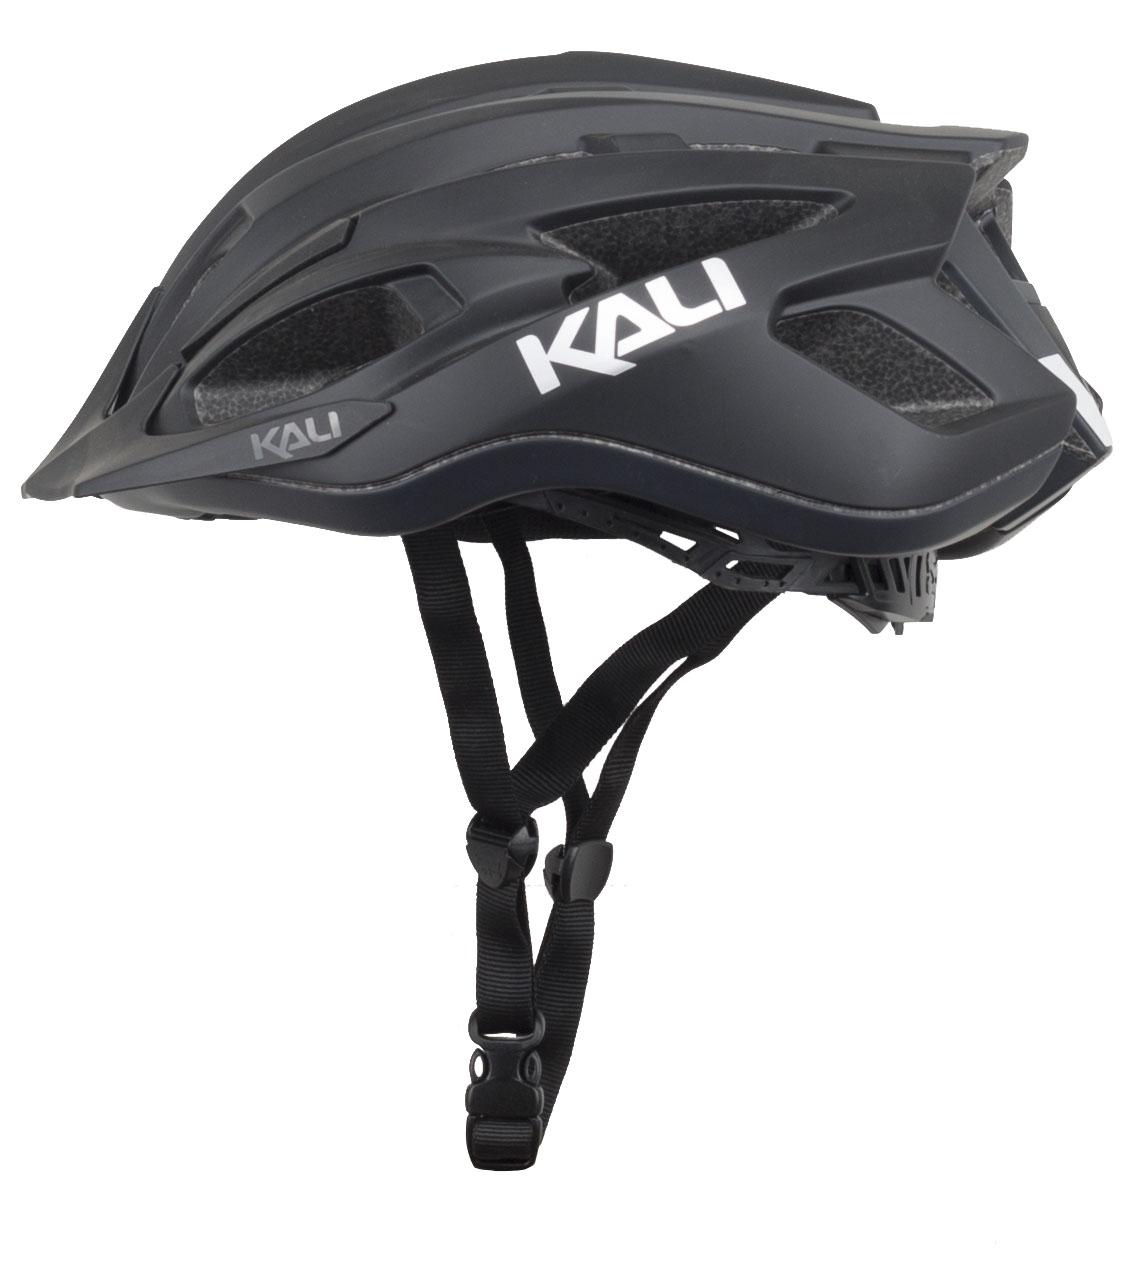 Kali Alchemy Solid Helmet Men's Size Large/Extra Large in Black